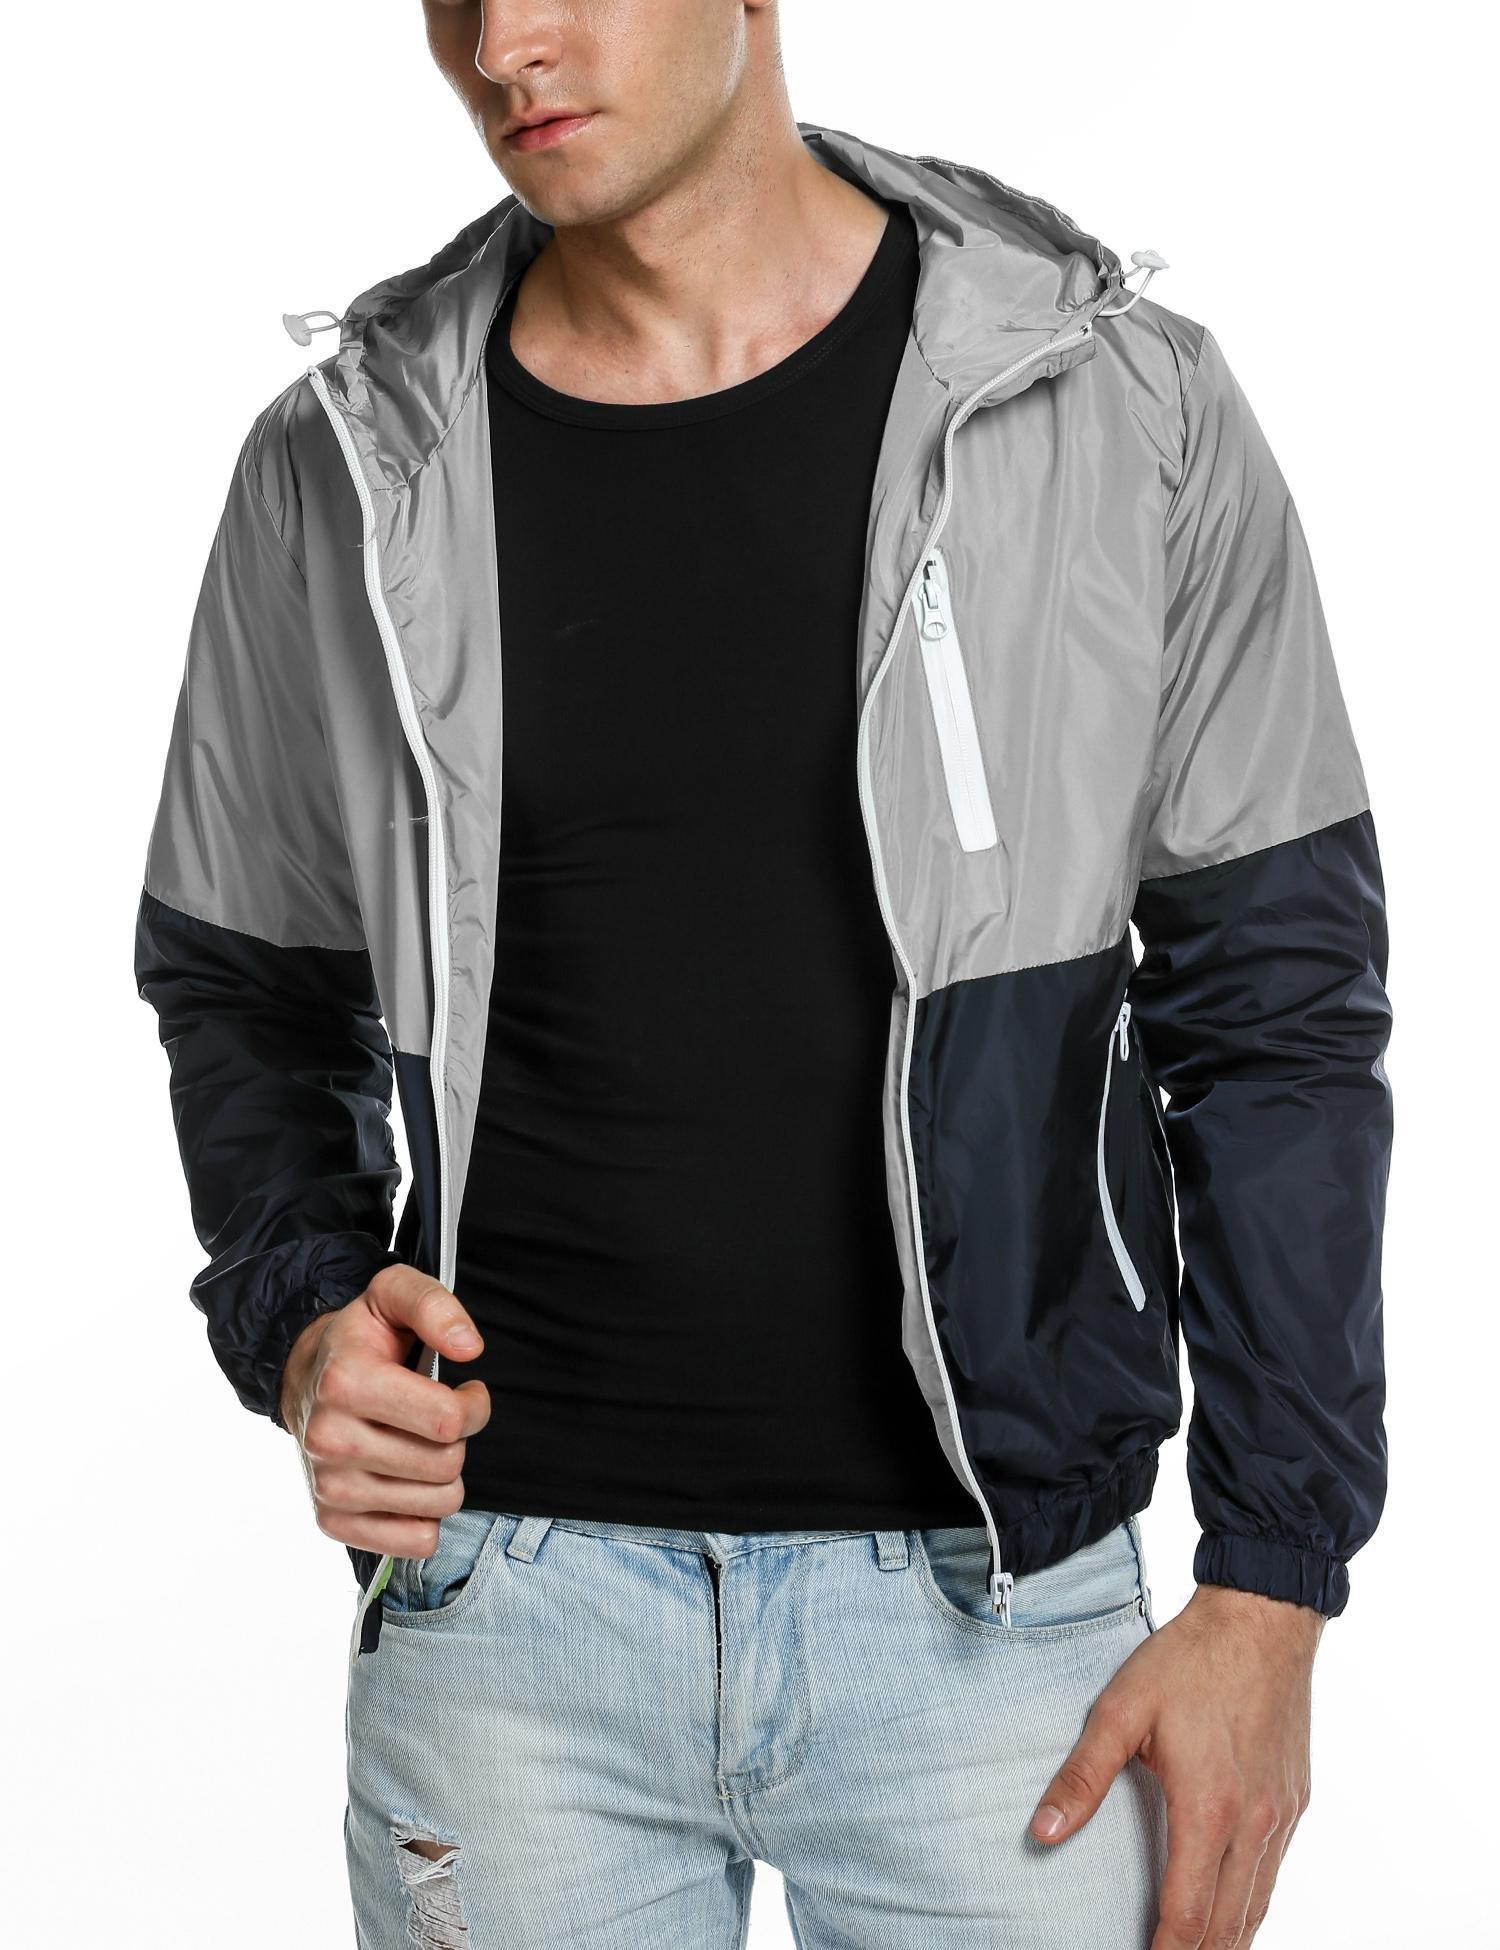 COOFANDY Mens Quick Dry Windbreaker Summer Lightweight Hooded Sun Protection Outwear,Gray,Medium